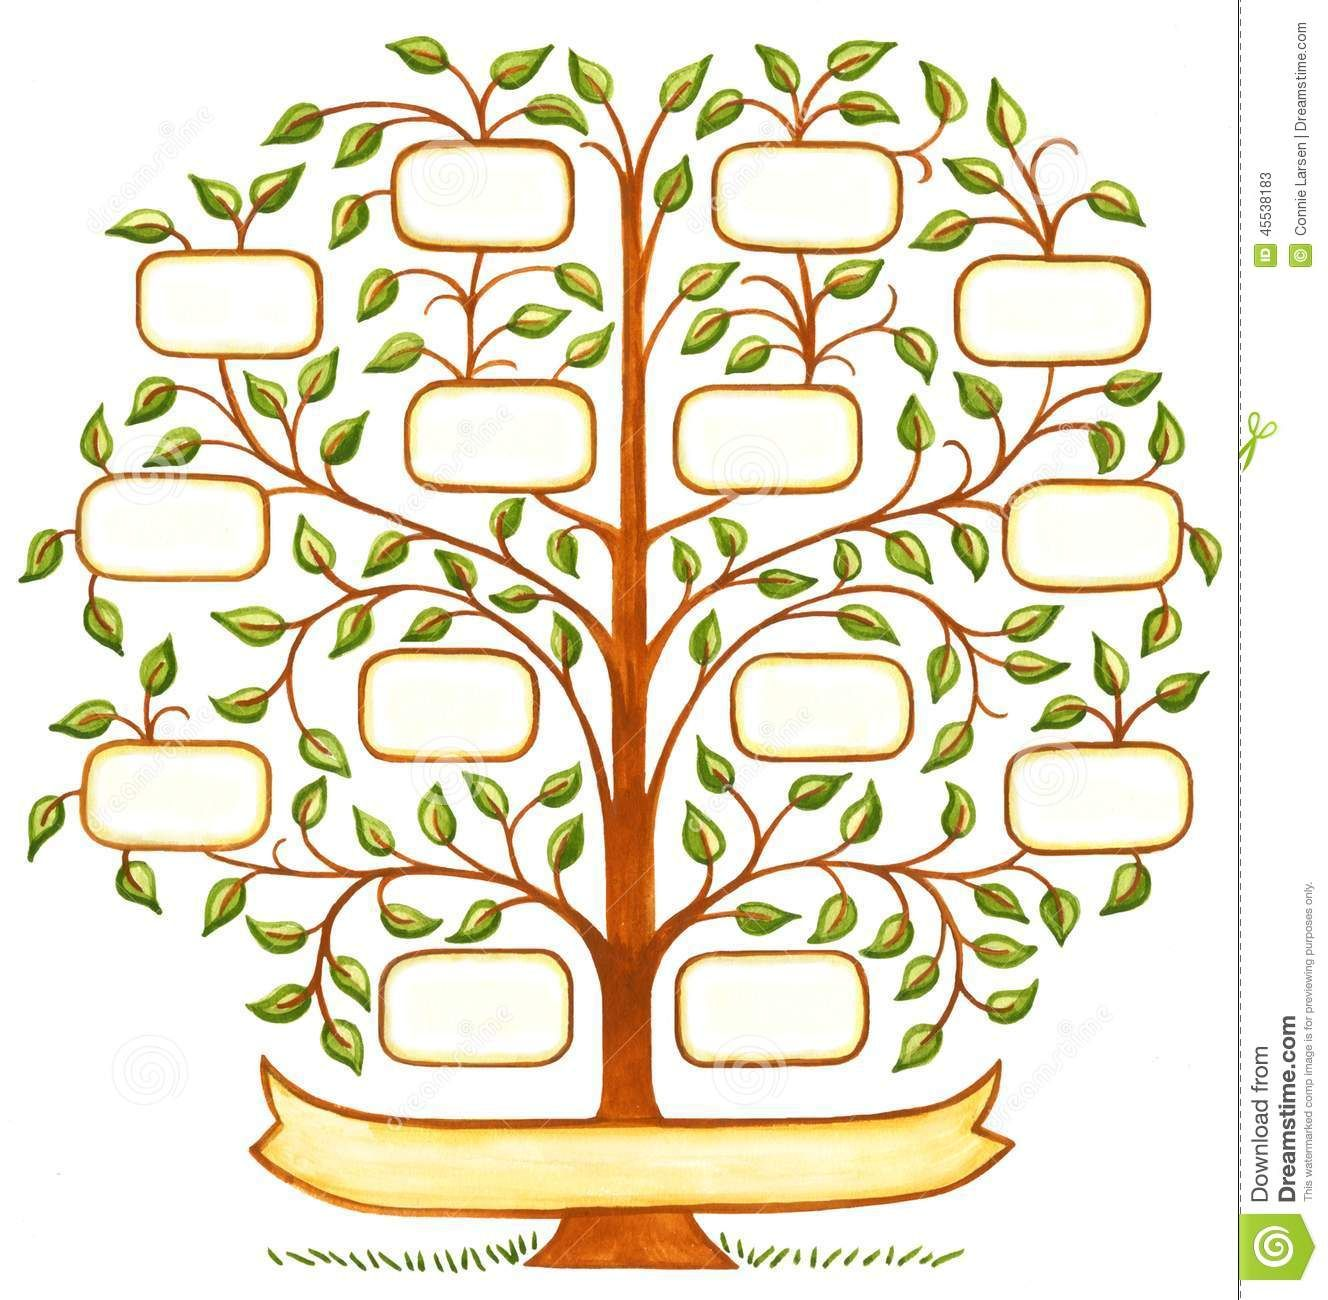 arvore genealogica gratis koni polycode co